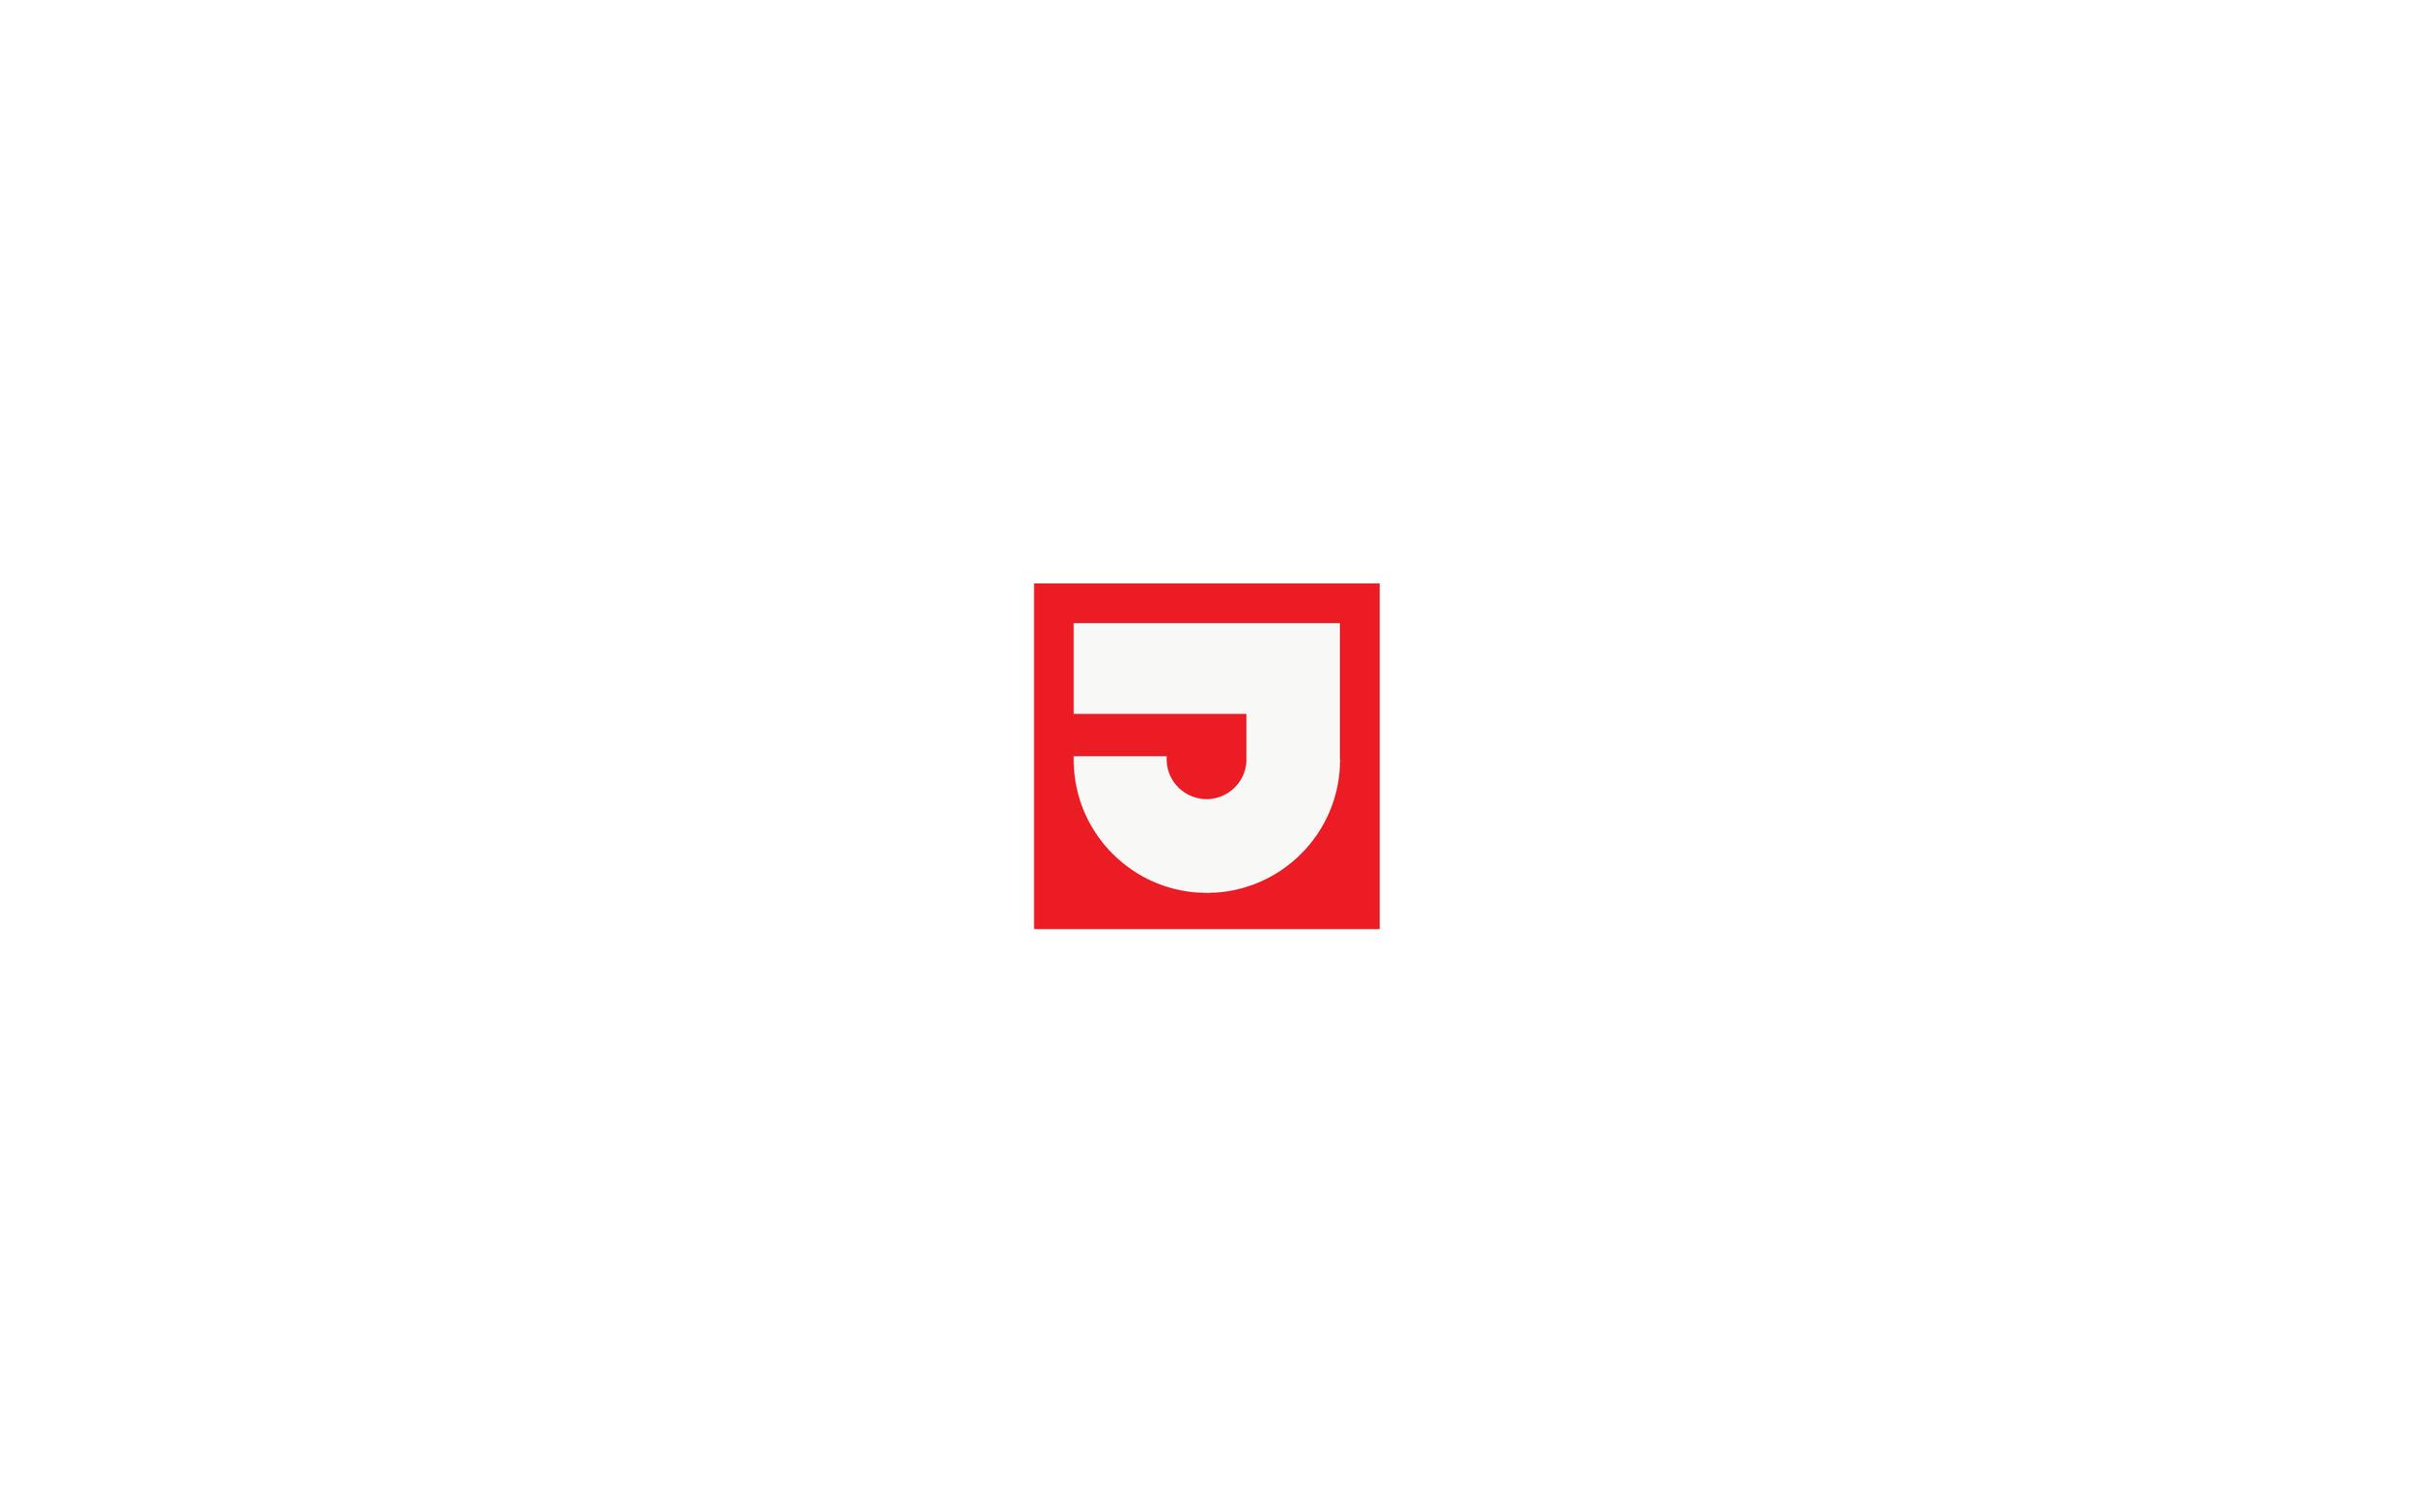 JIREH 'J' BUG